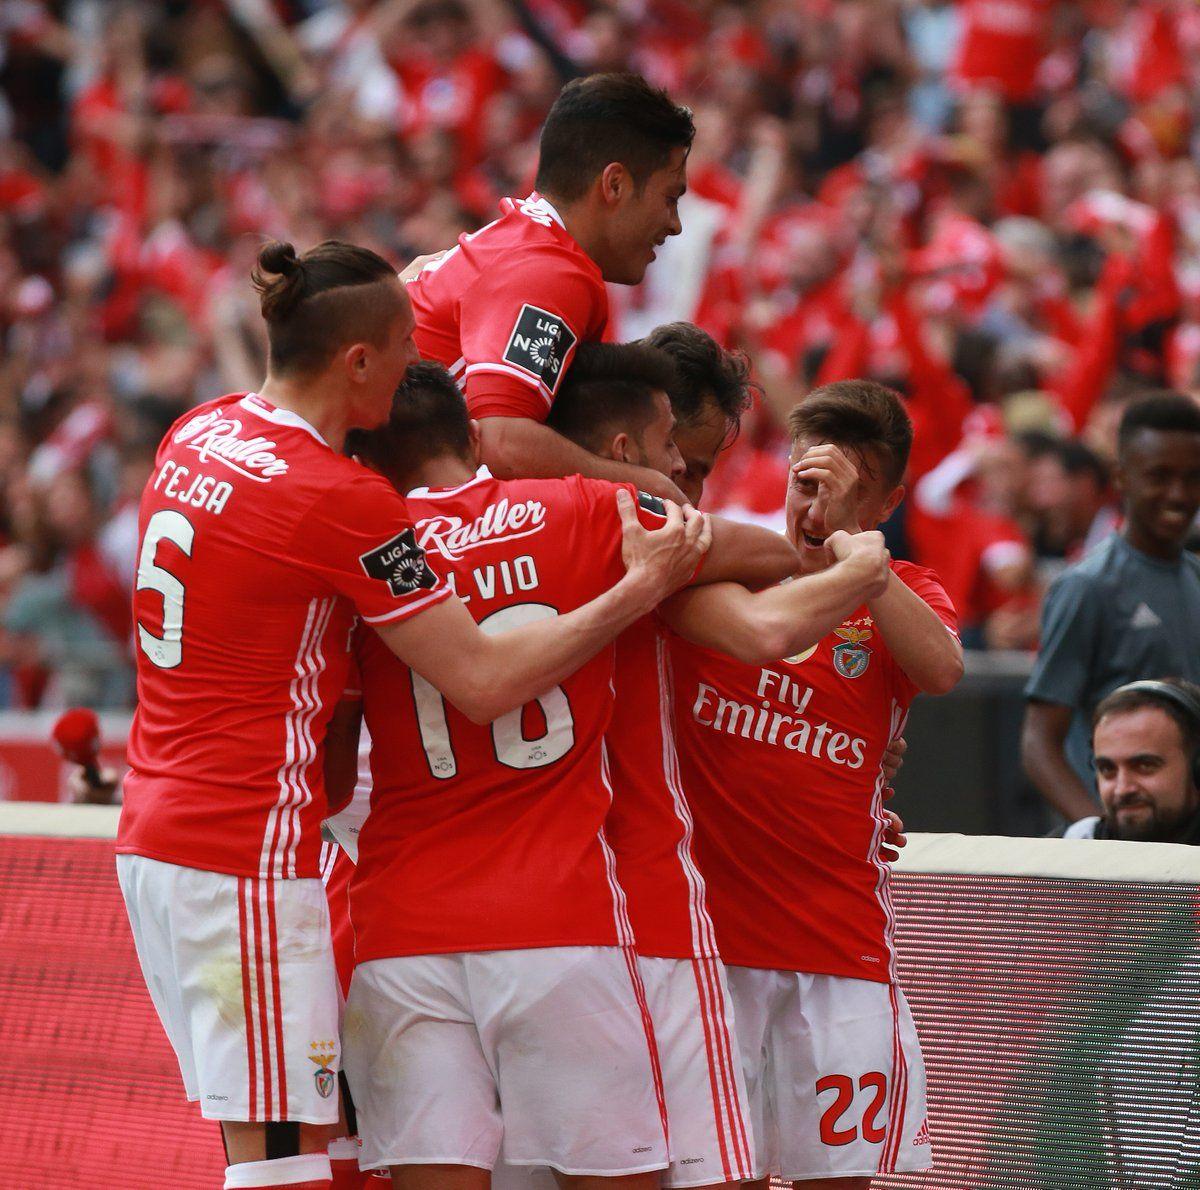 SL Benfica EN (slbenfica_en) Twitter Deportes